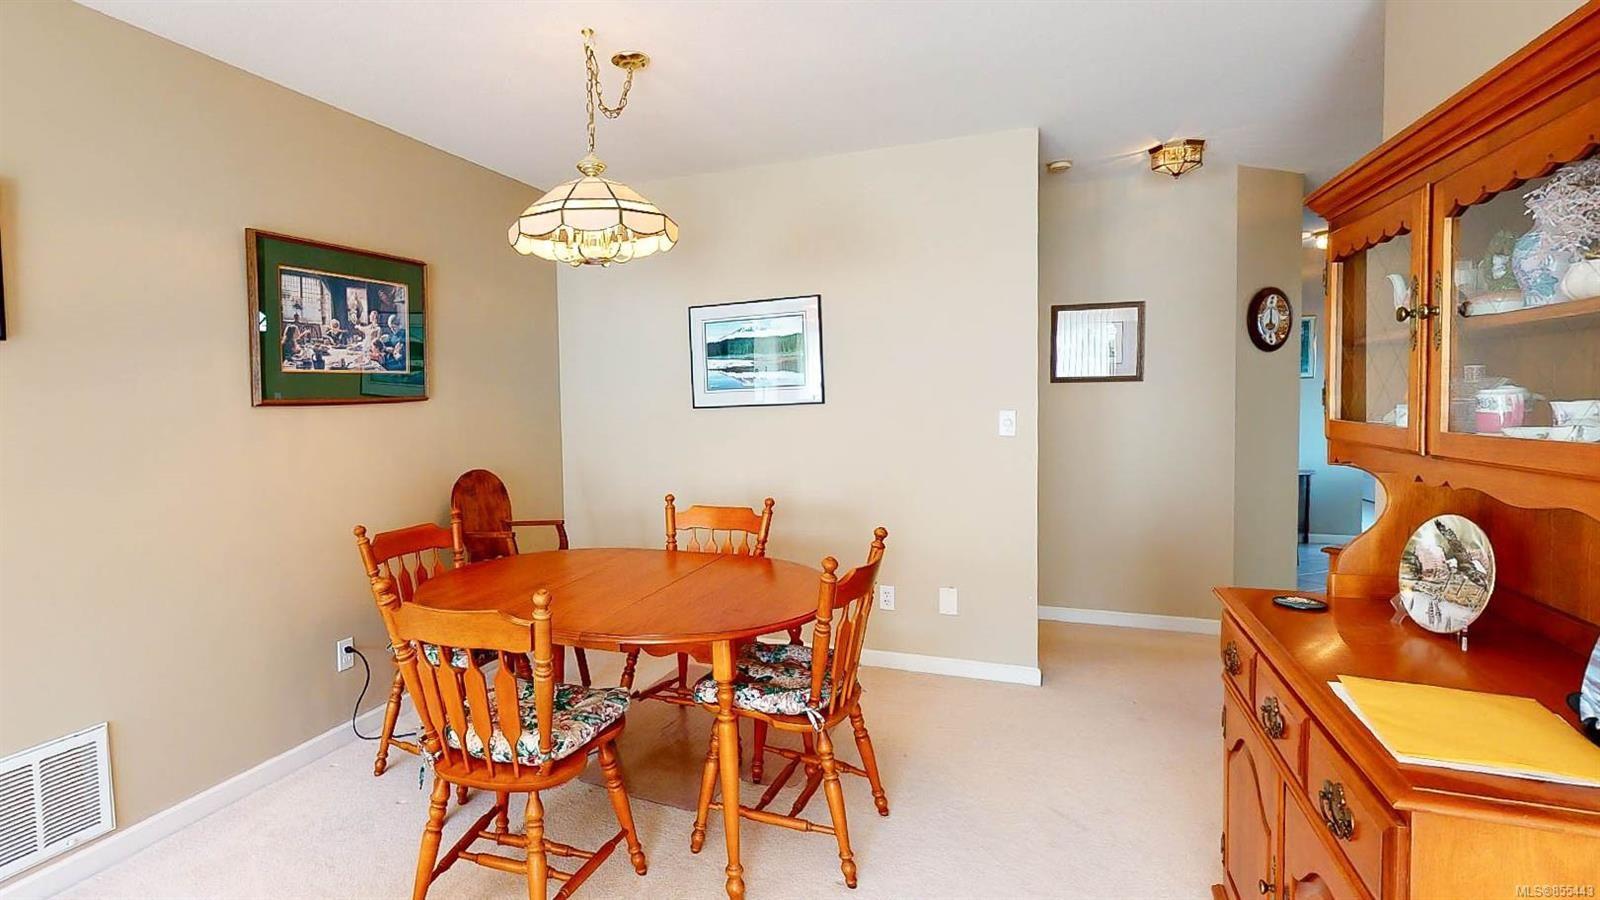 Photo 18: Photos: 1294 Leeward Way in : PQ Qualicum Beach House for sale (Parksville/Qualicum)  : MLS®# 855443